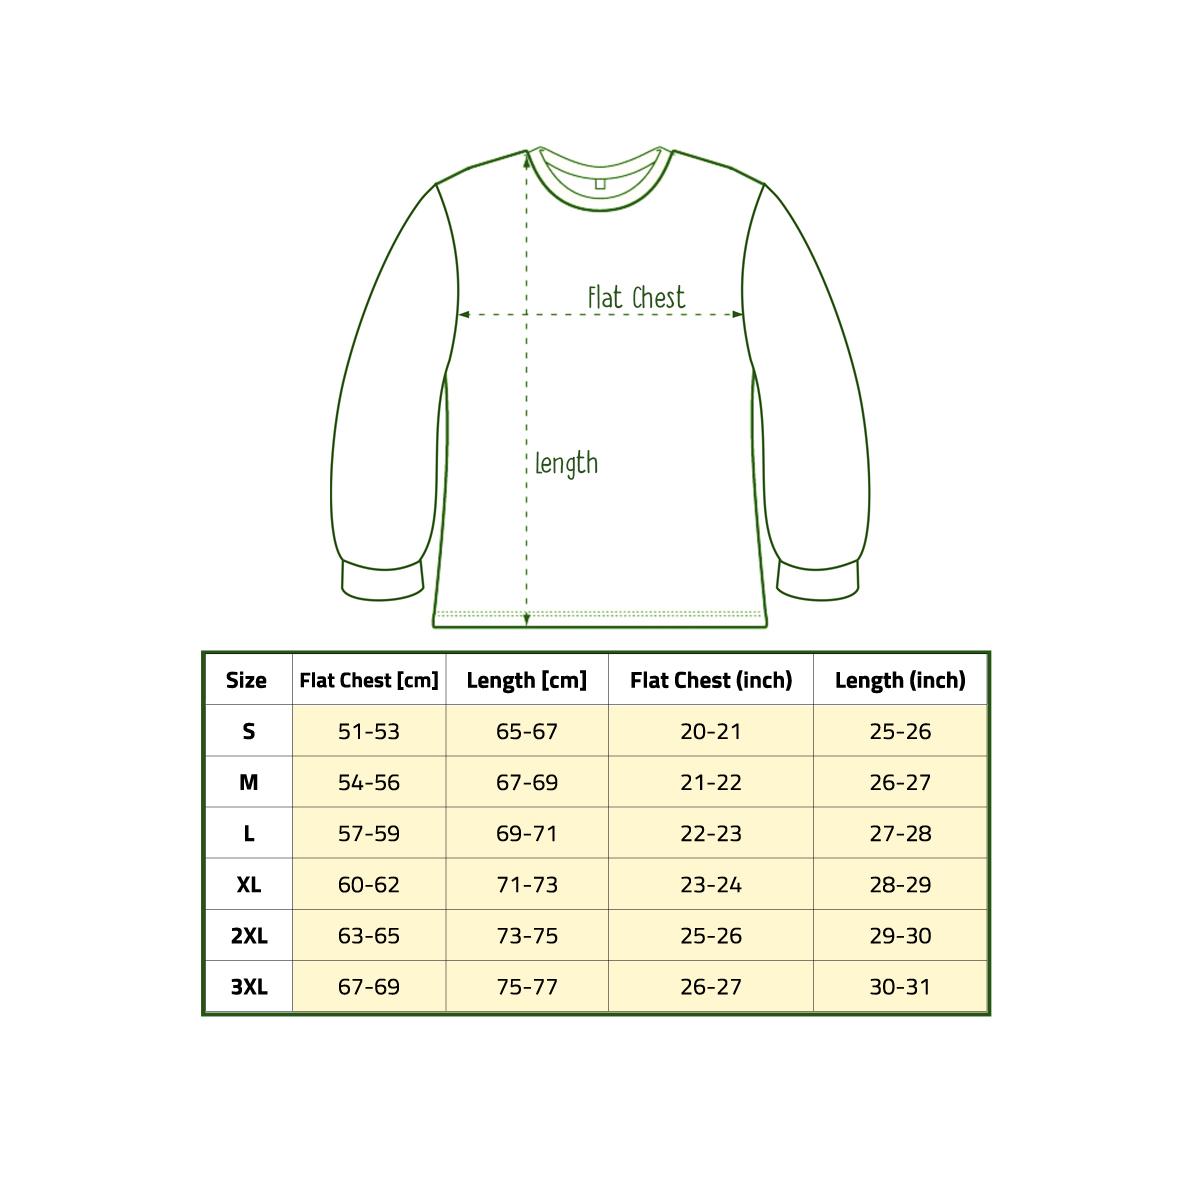 thumbnail 4 - Moonshine Midnight Runners Men Sweatshirt S-3XL New